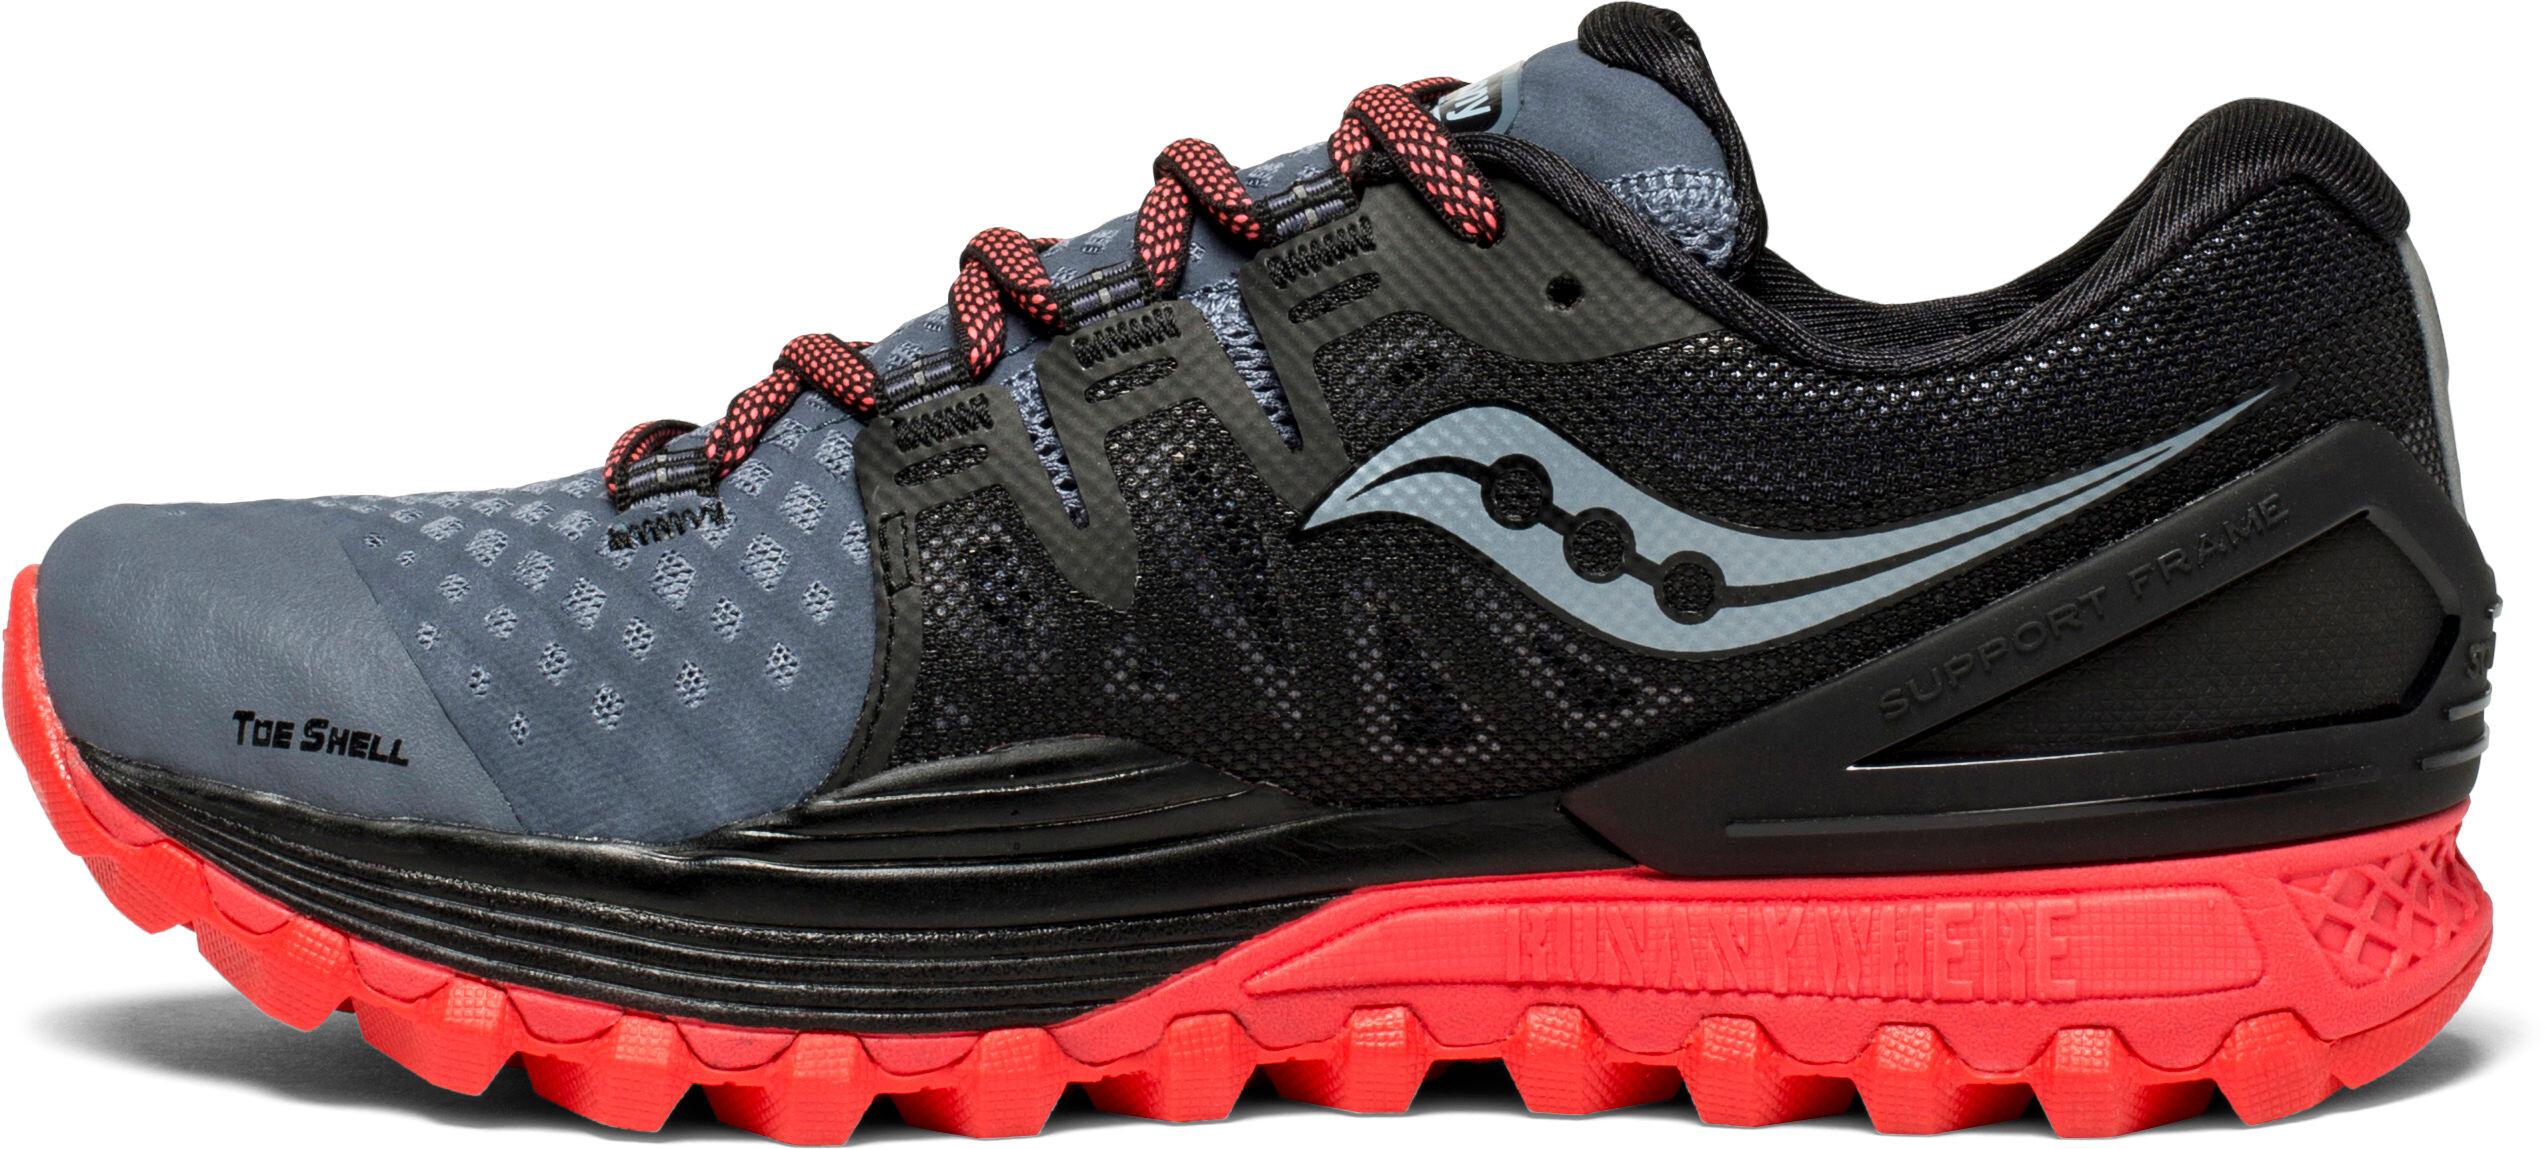 b6e046c23e1 saucony Xodus ISO 2 - Chaussures running Femme - gris noir ...